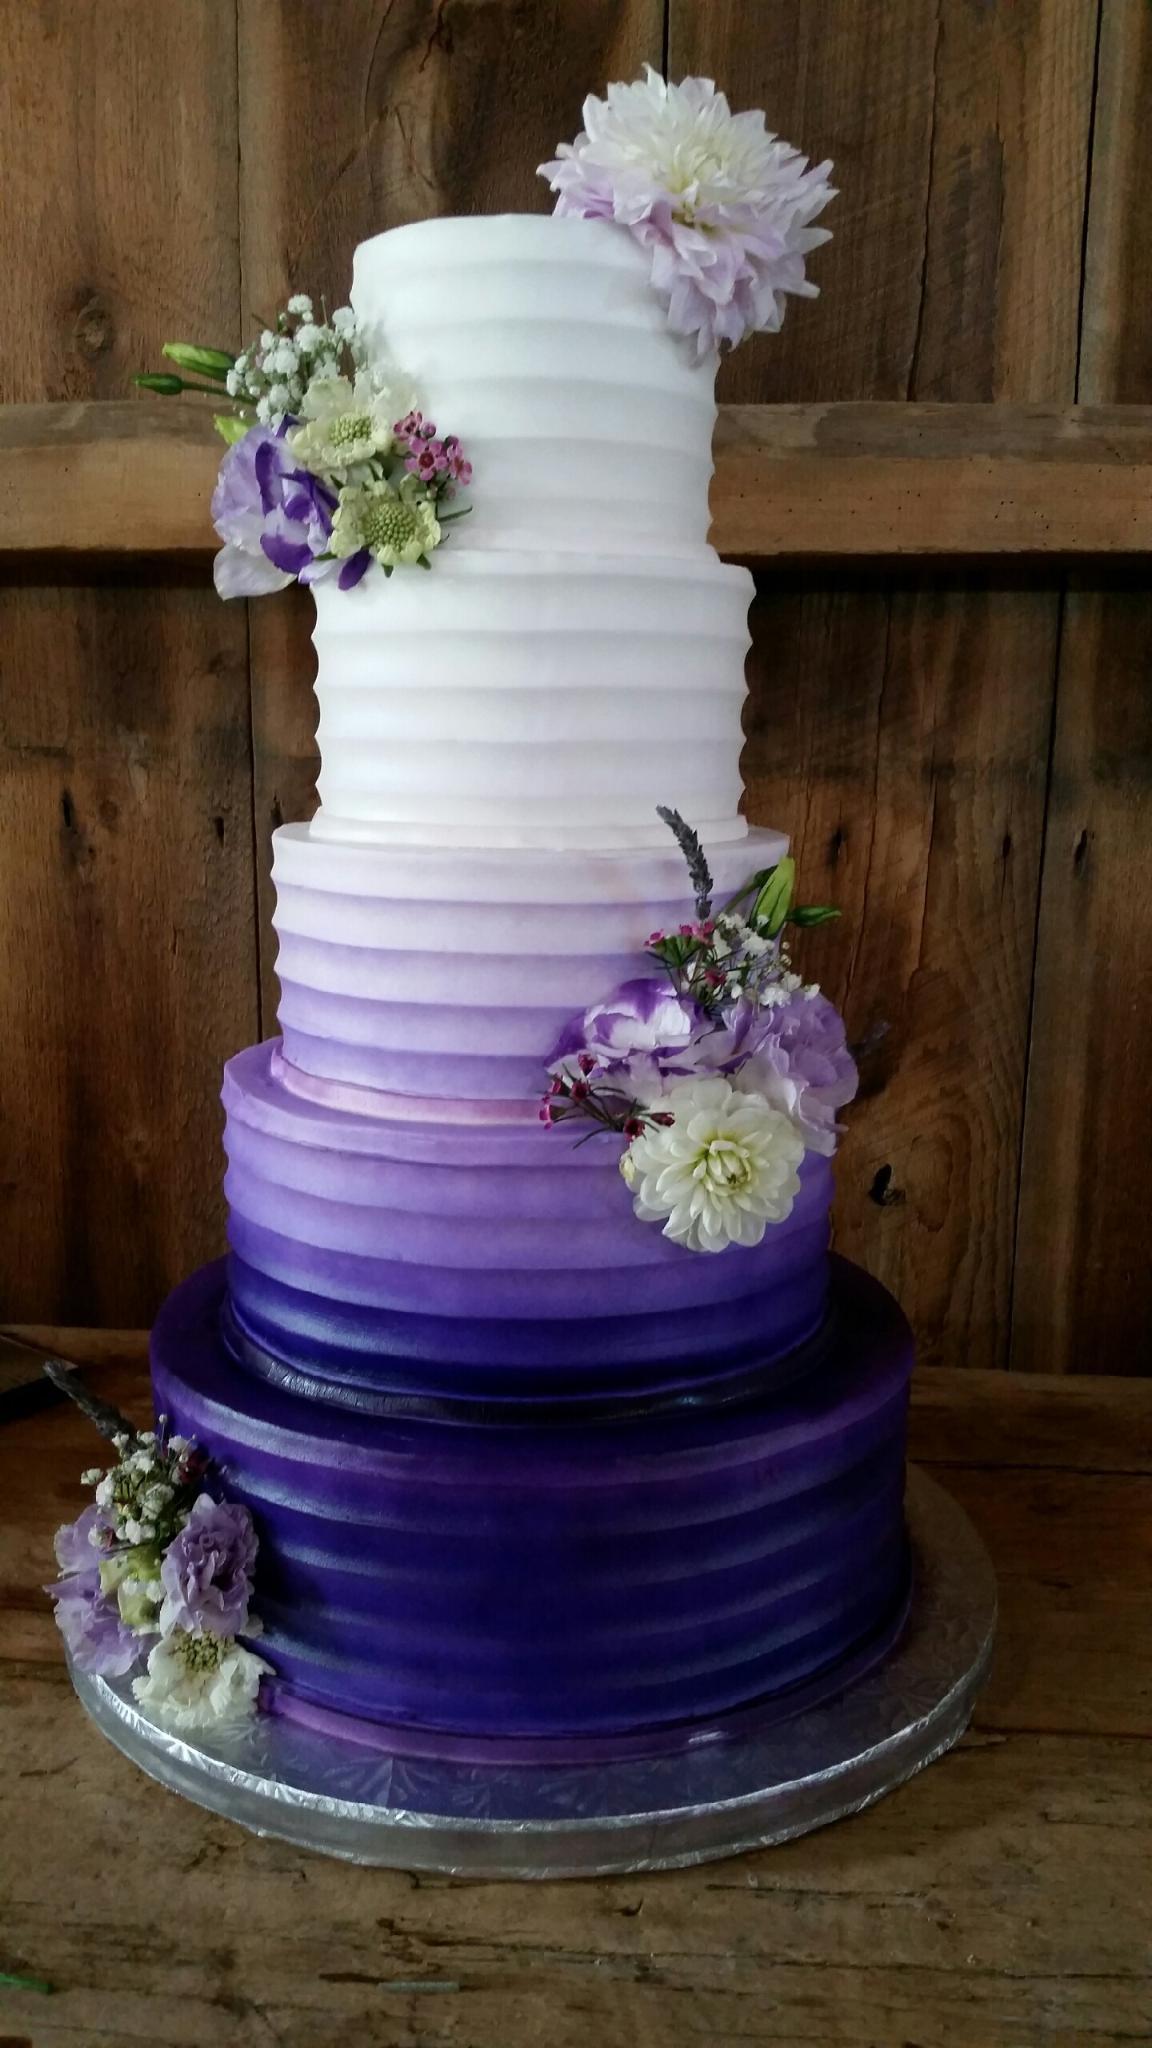 Wedding Cakes by Tammy Allen image 25